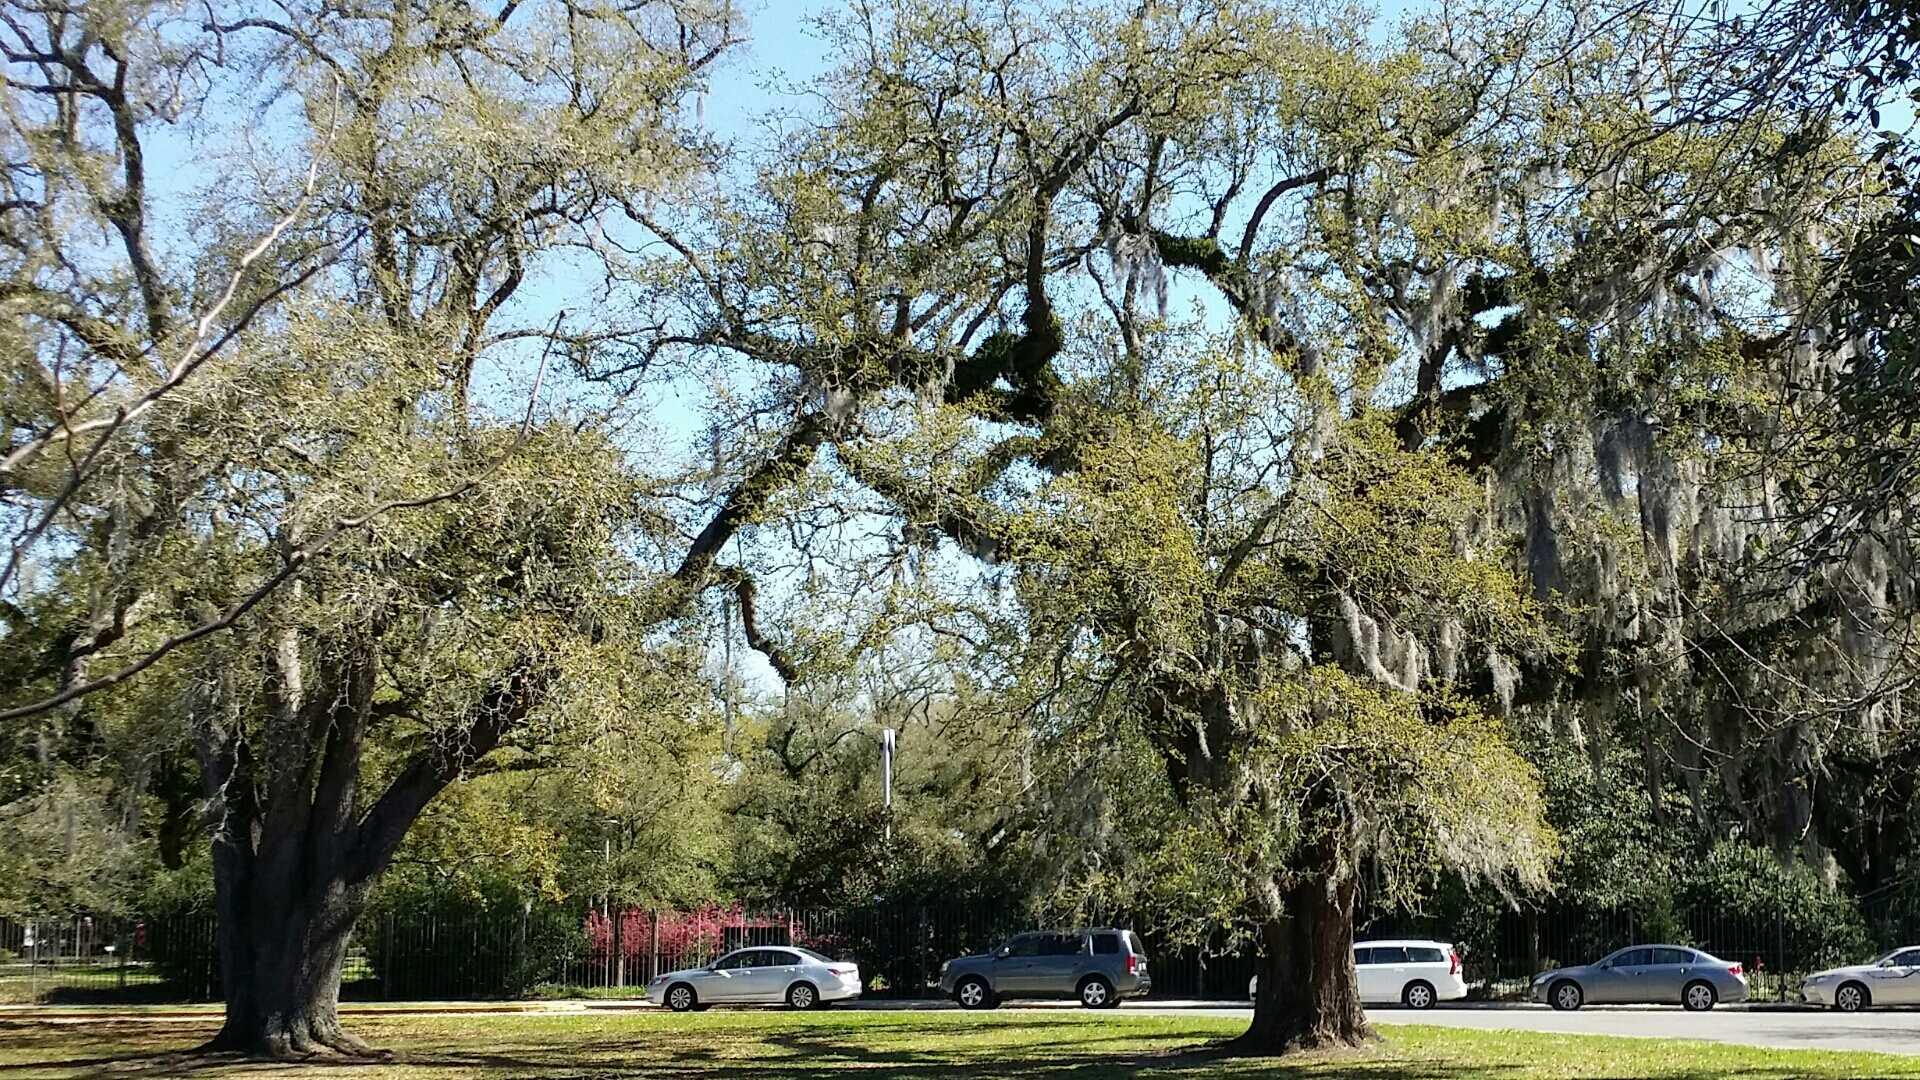 Trees leafing out - Meg Spring.jpg